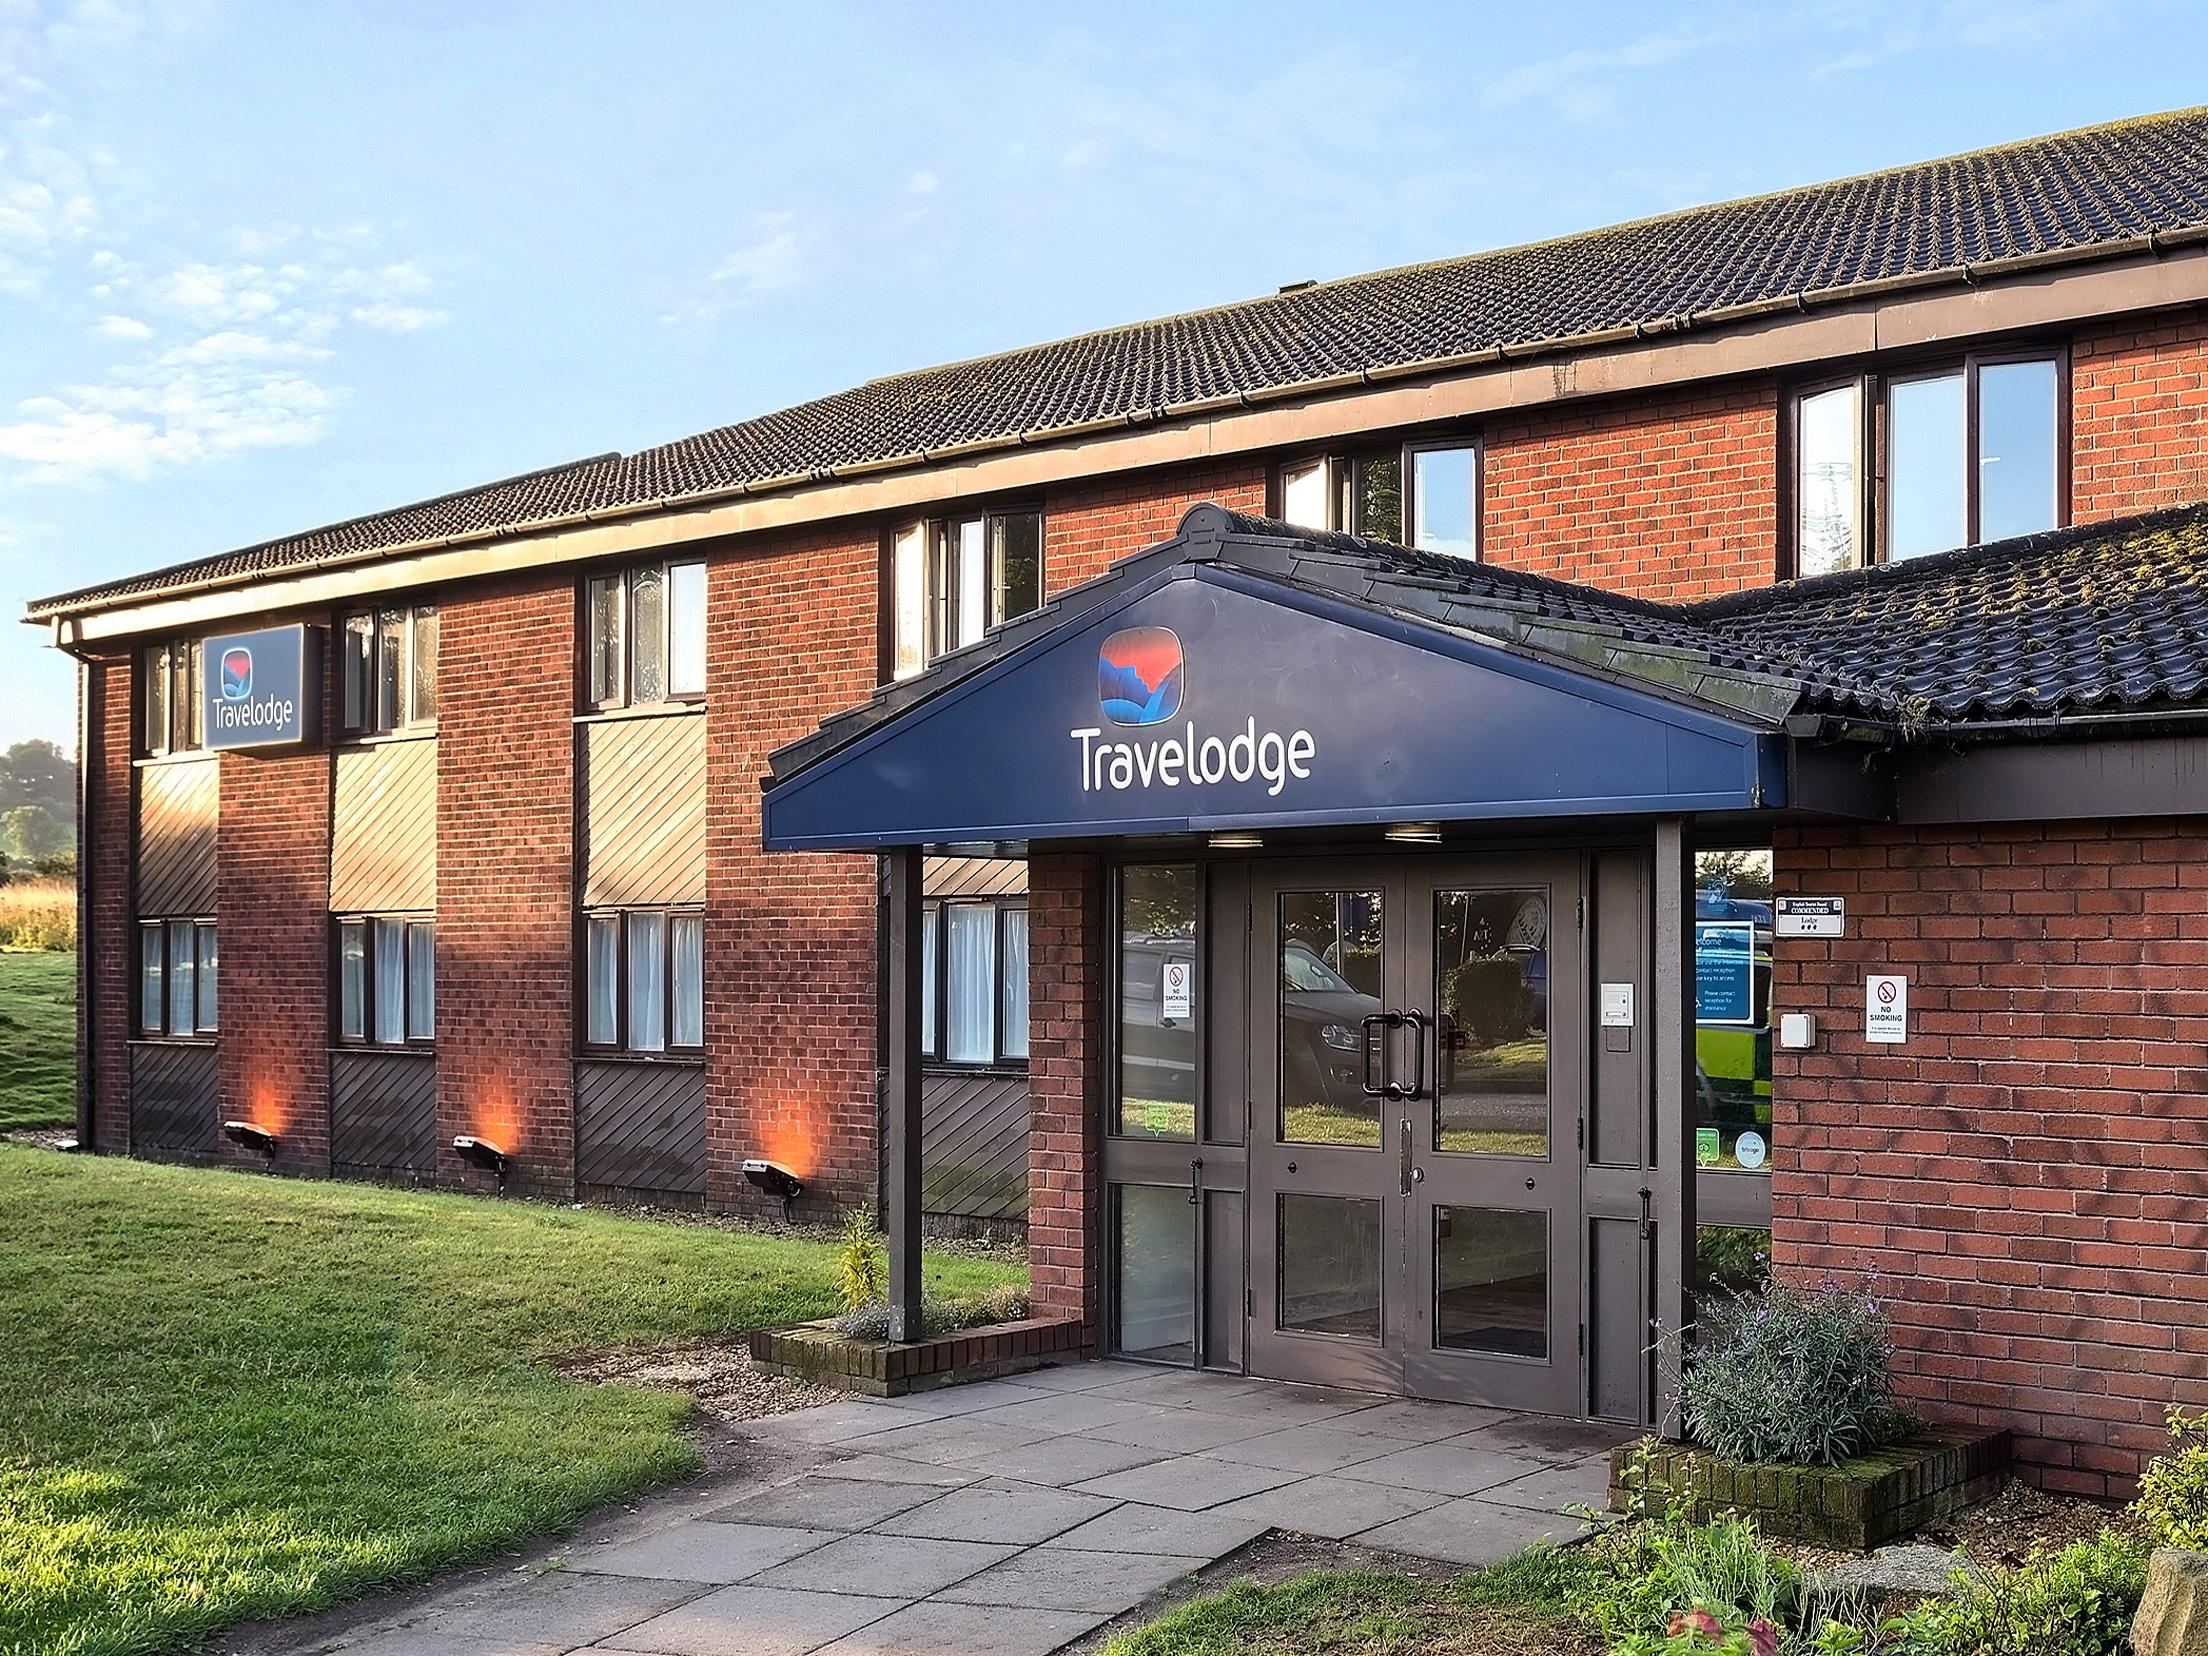 Travelodge Grantham A1, Lincolnshire